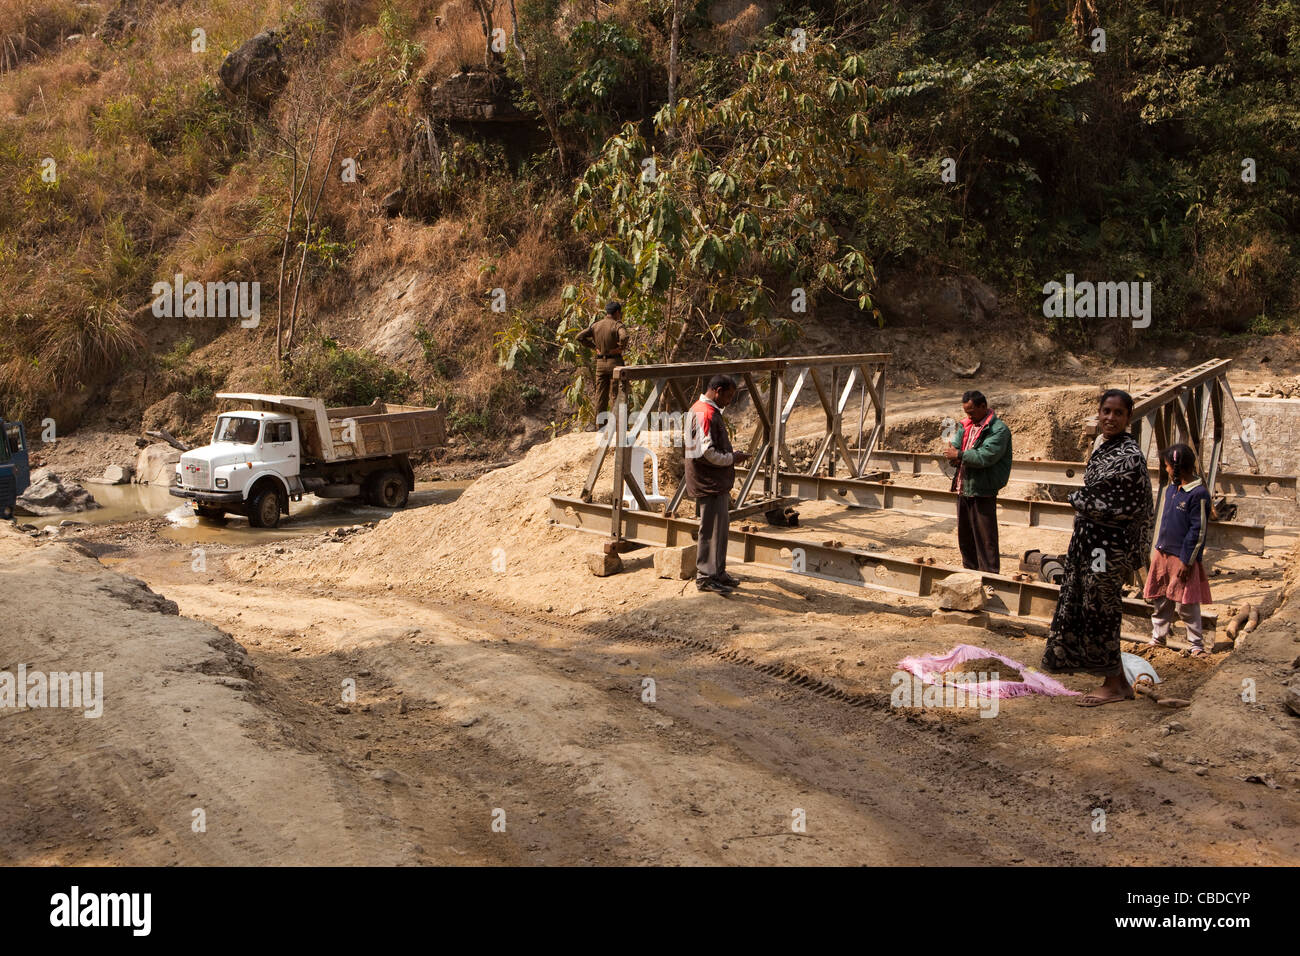 India, Nagaland, Khonoma, truck fording river where bridge being constructed - Stock Image